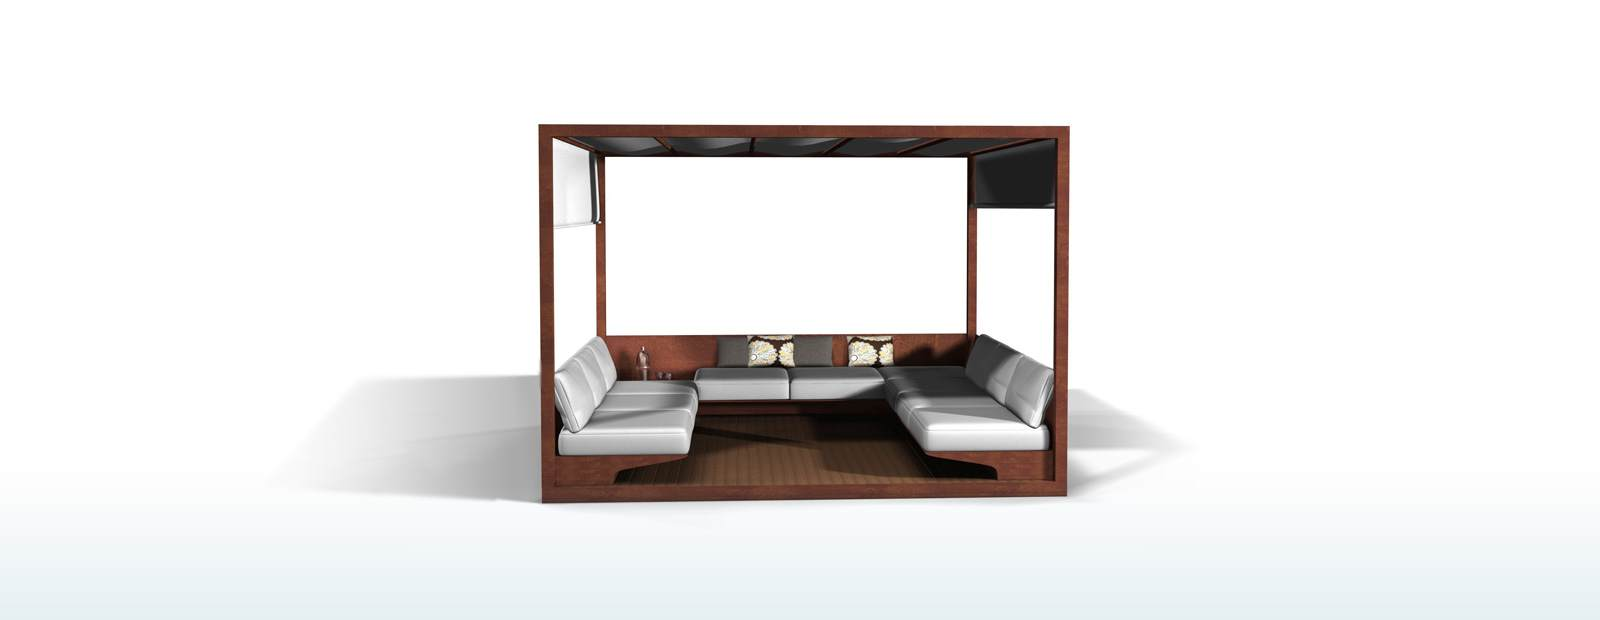 ARIA23 Outdoor Collection : homeMarconatoZappagazebo from aria23.com size 1600 x 620 jpeg 25kB